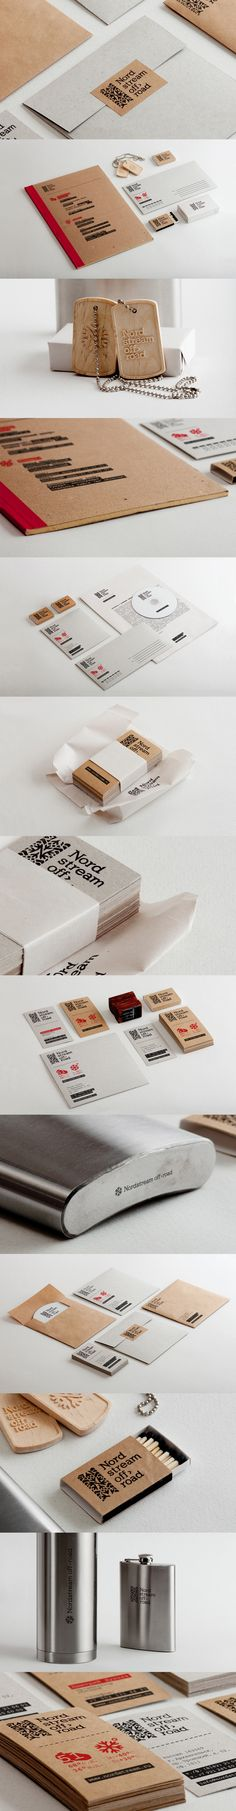 http://www.revision.ru/work/52955 | #stationary #corporate #design #corporatedesign #logo #identity #branding #marketing <<< repinned by an #advertising agency from #Hamburg / #Germany - www.BlickeDeeler.de | Follow us on www.facebook.com/BlickeDeeler